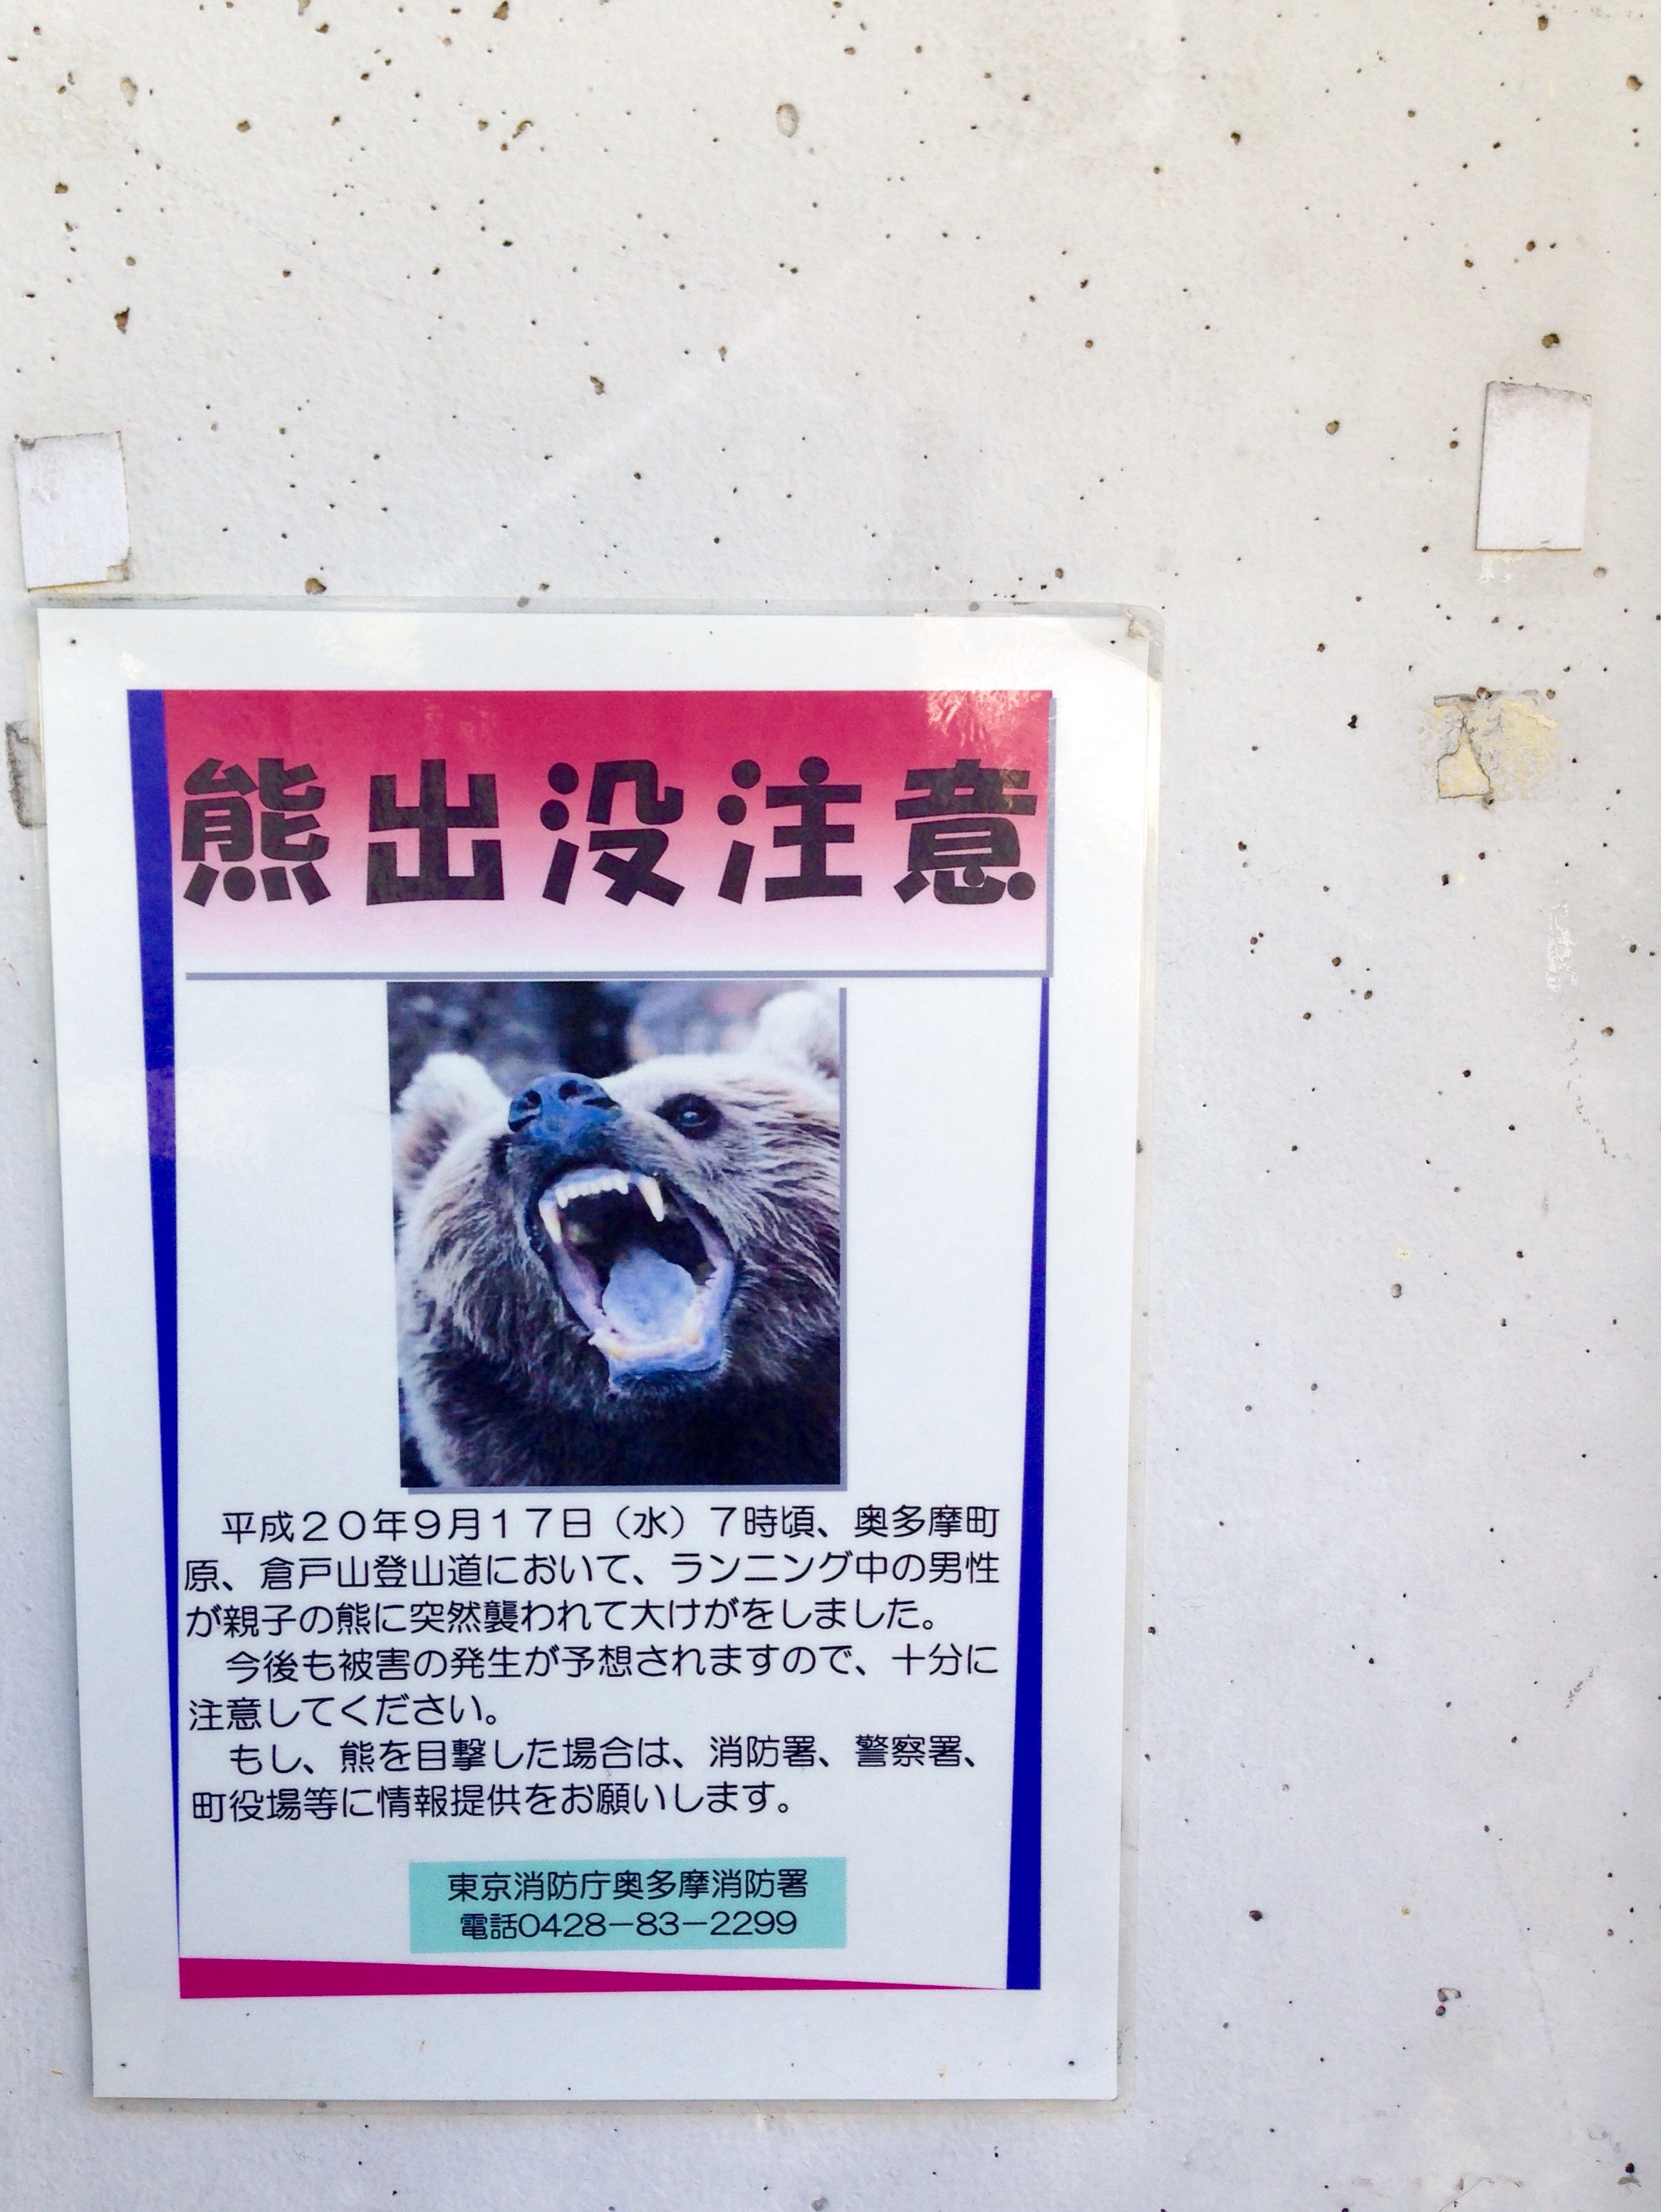 Bear on Tokyo? Yes beware!